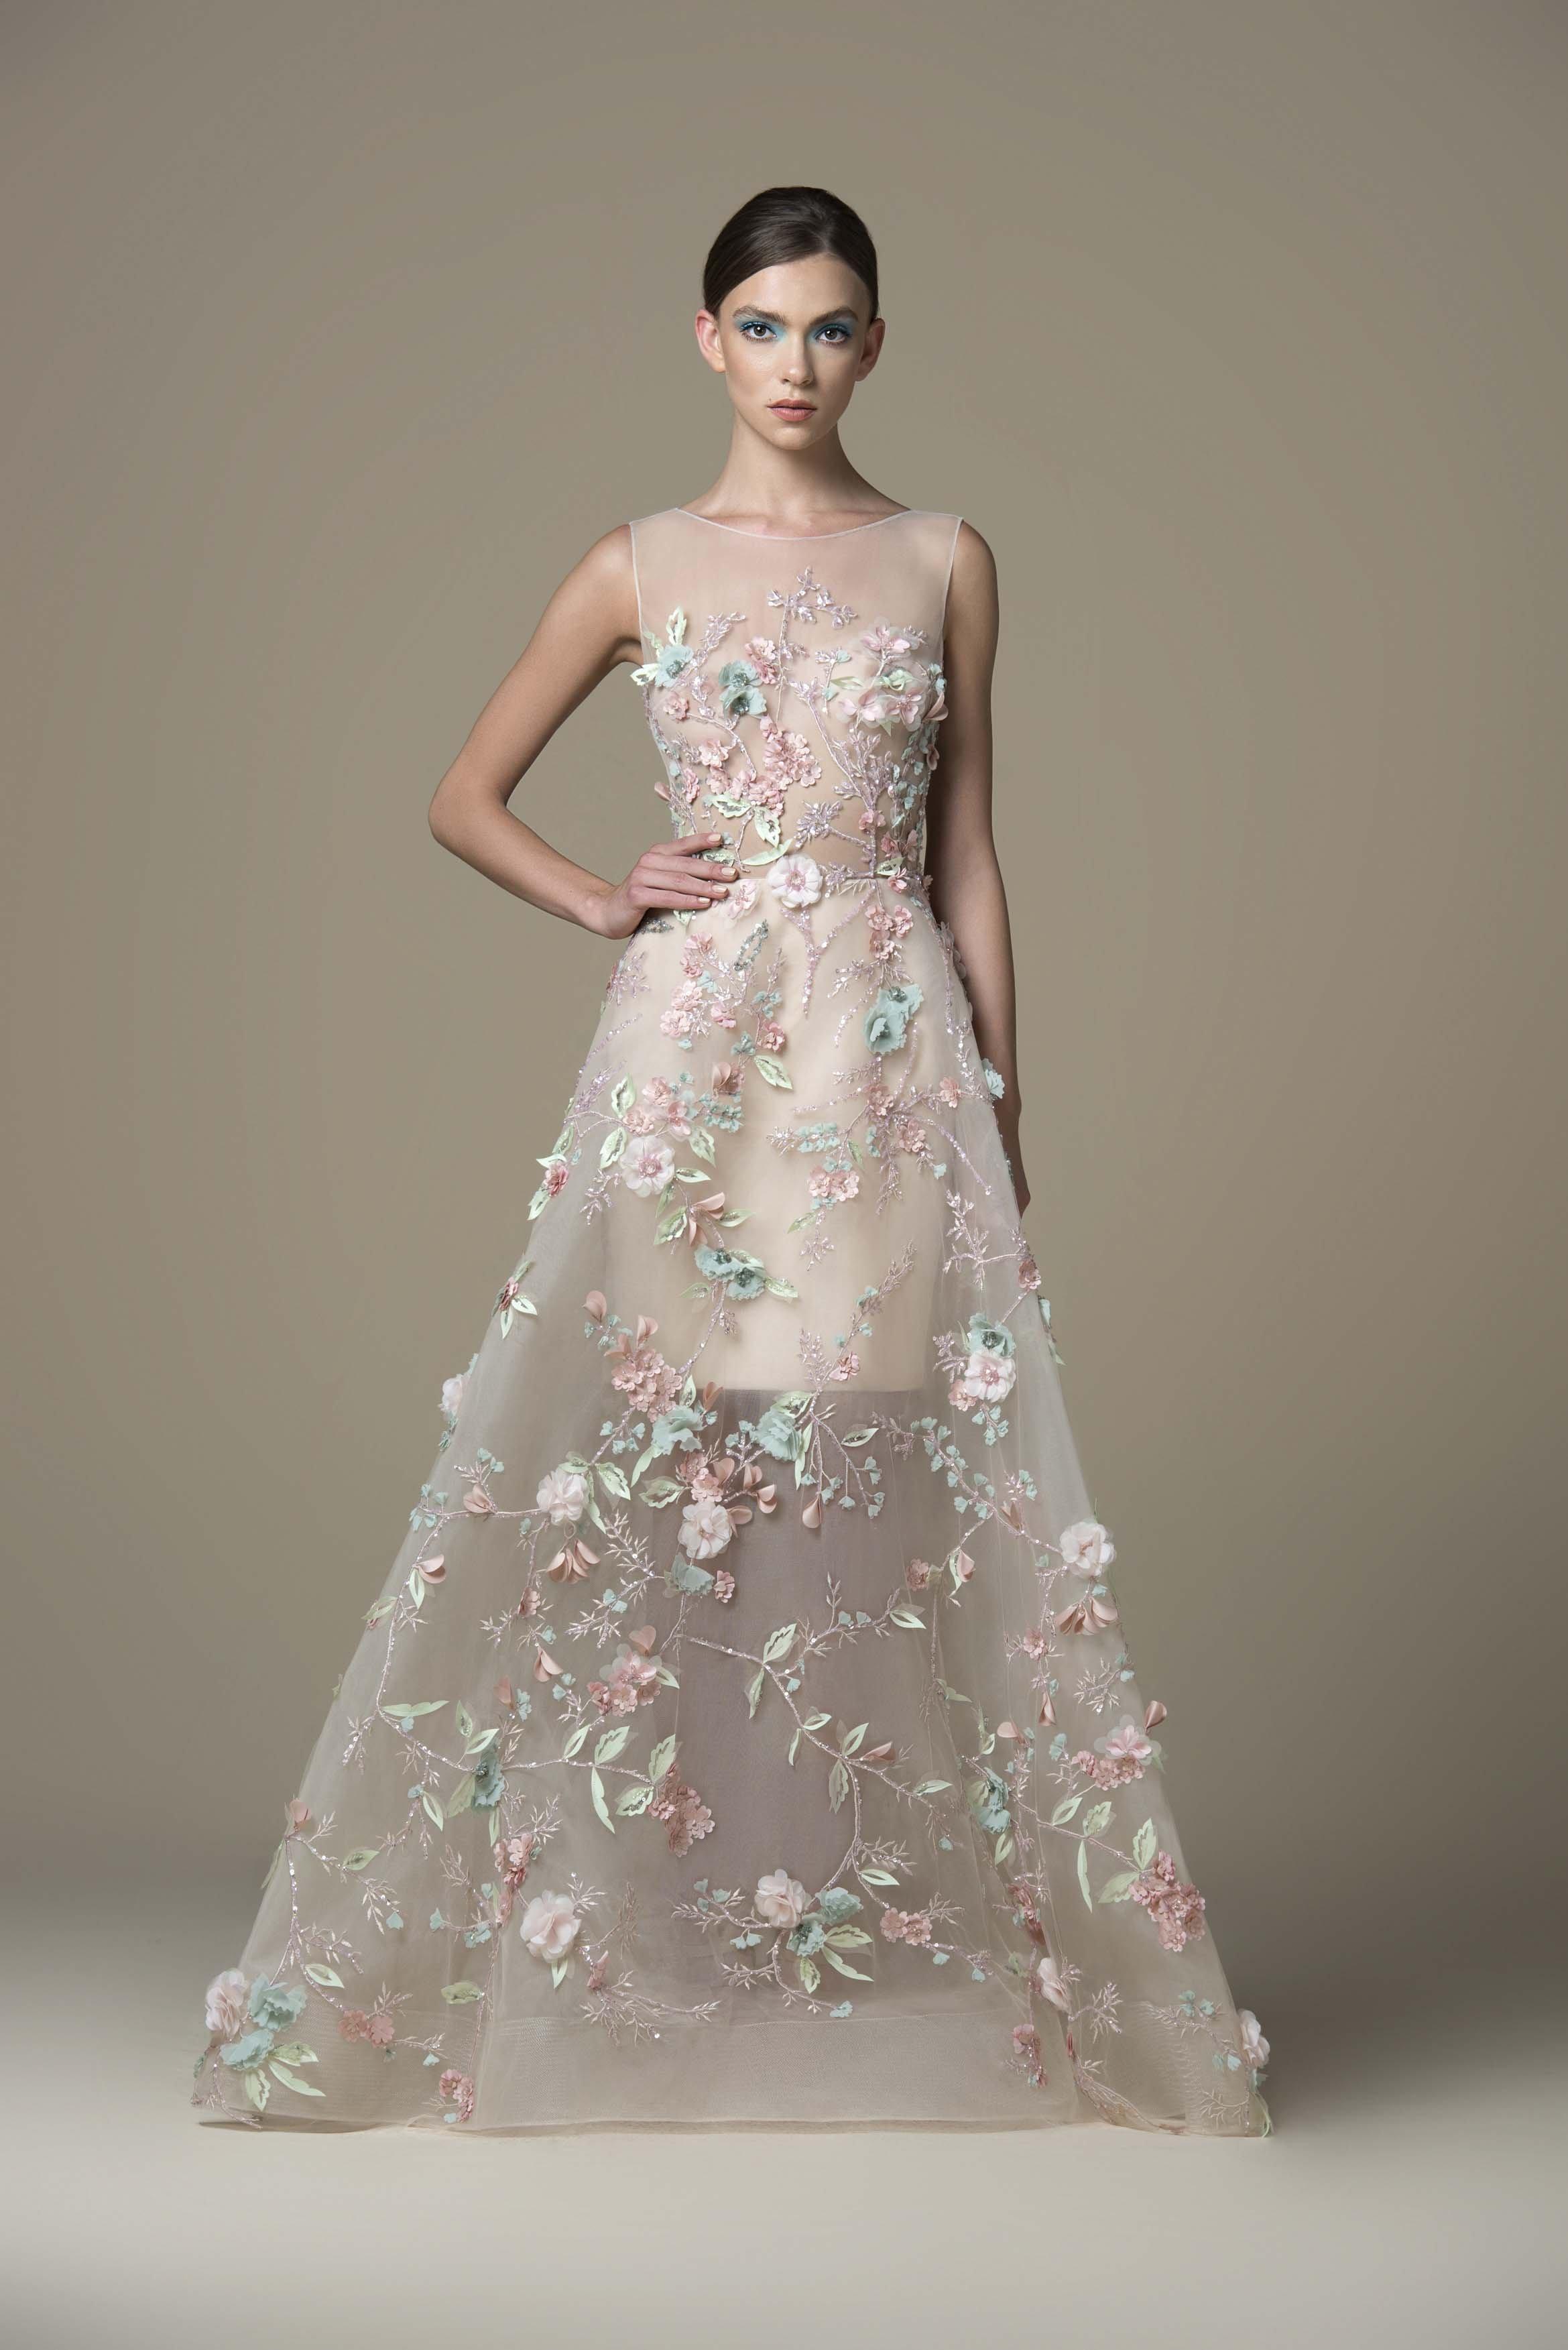 Saiid Kobeisy - RTWSS19-18 Floral Applique Bateau A-line Gown